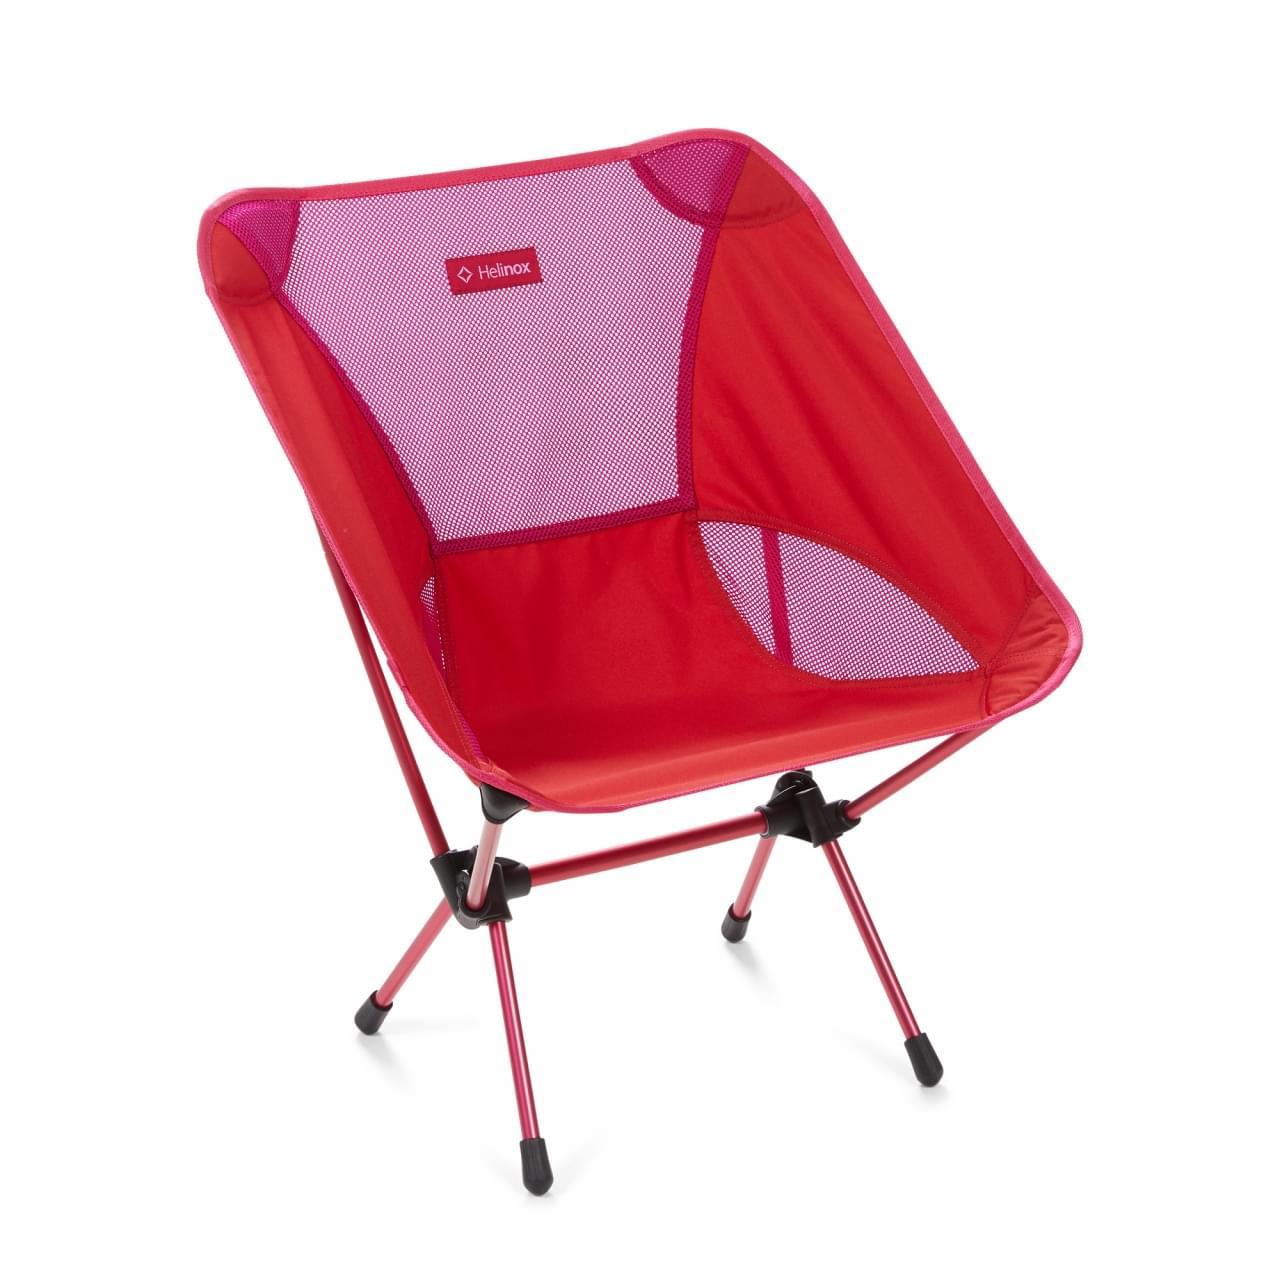 Helinox Chair One Block Lichtgewicht Stoel - Rood